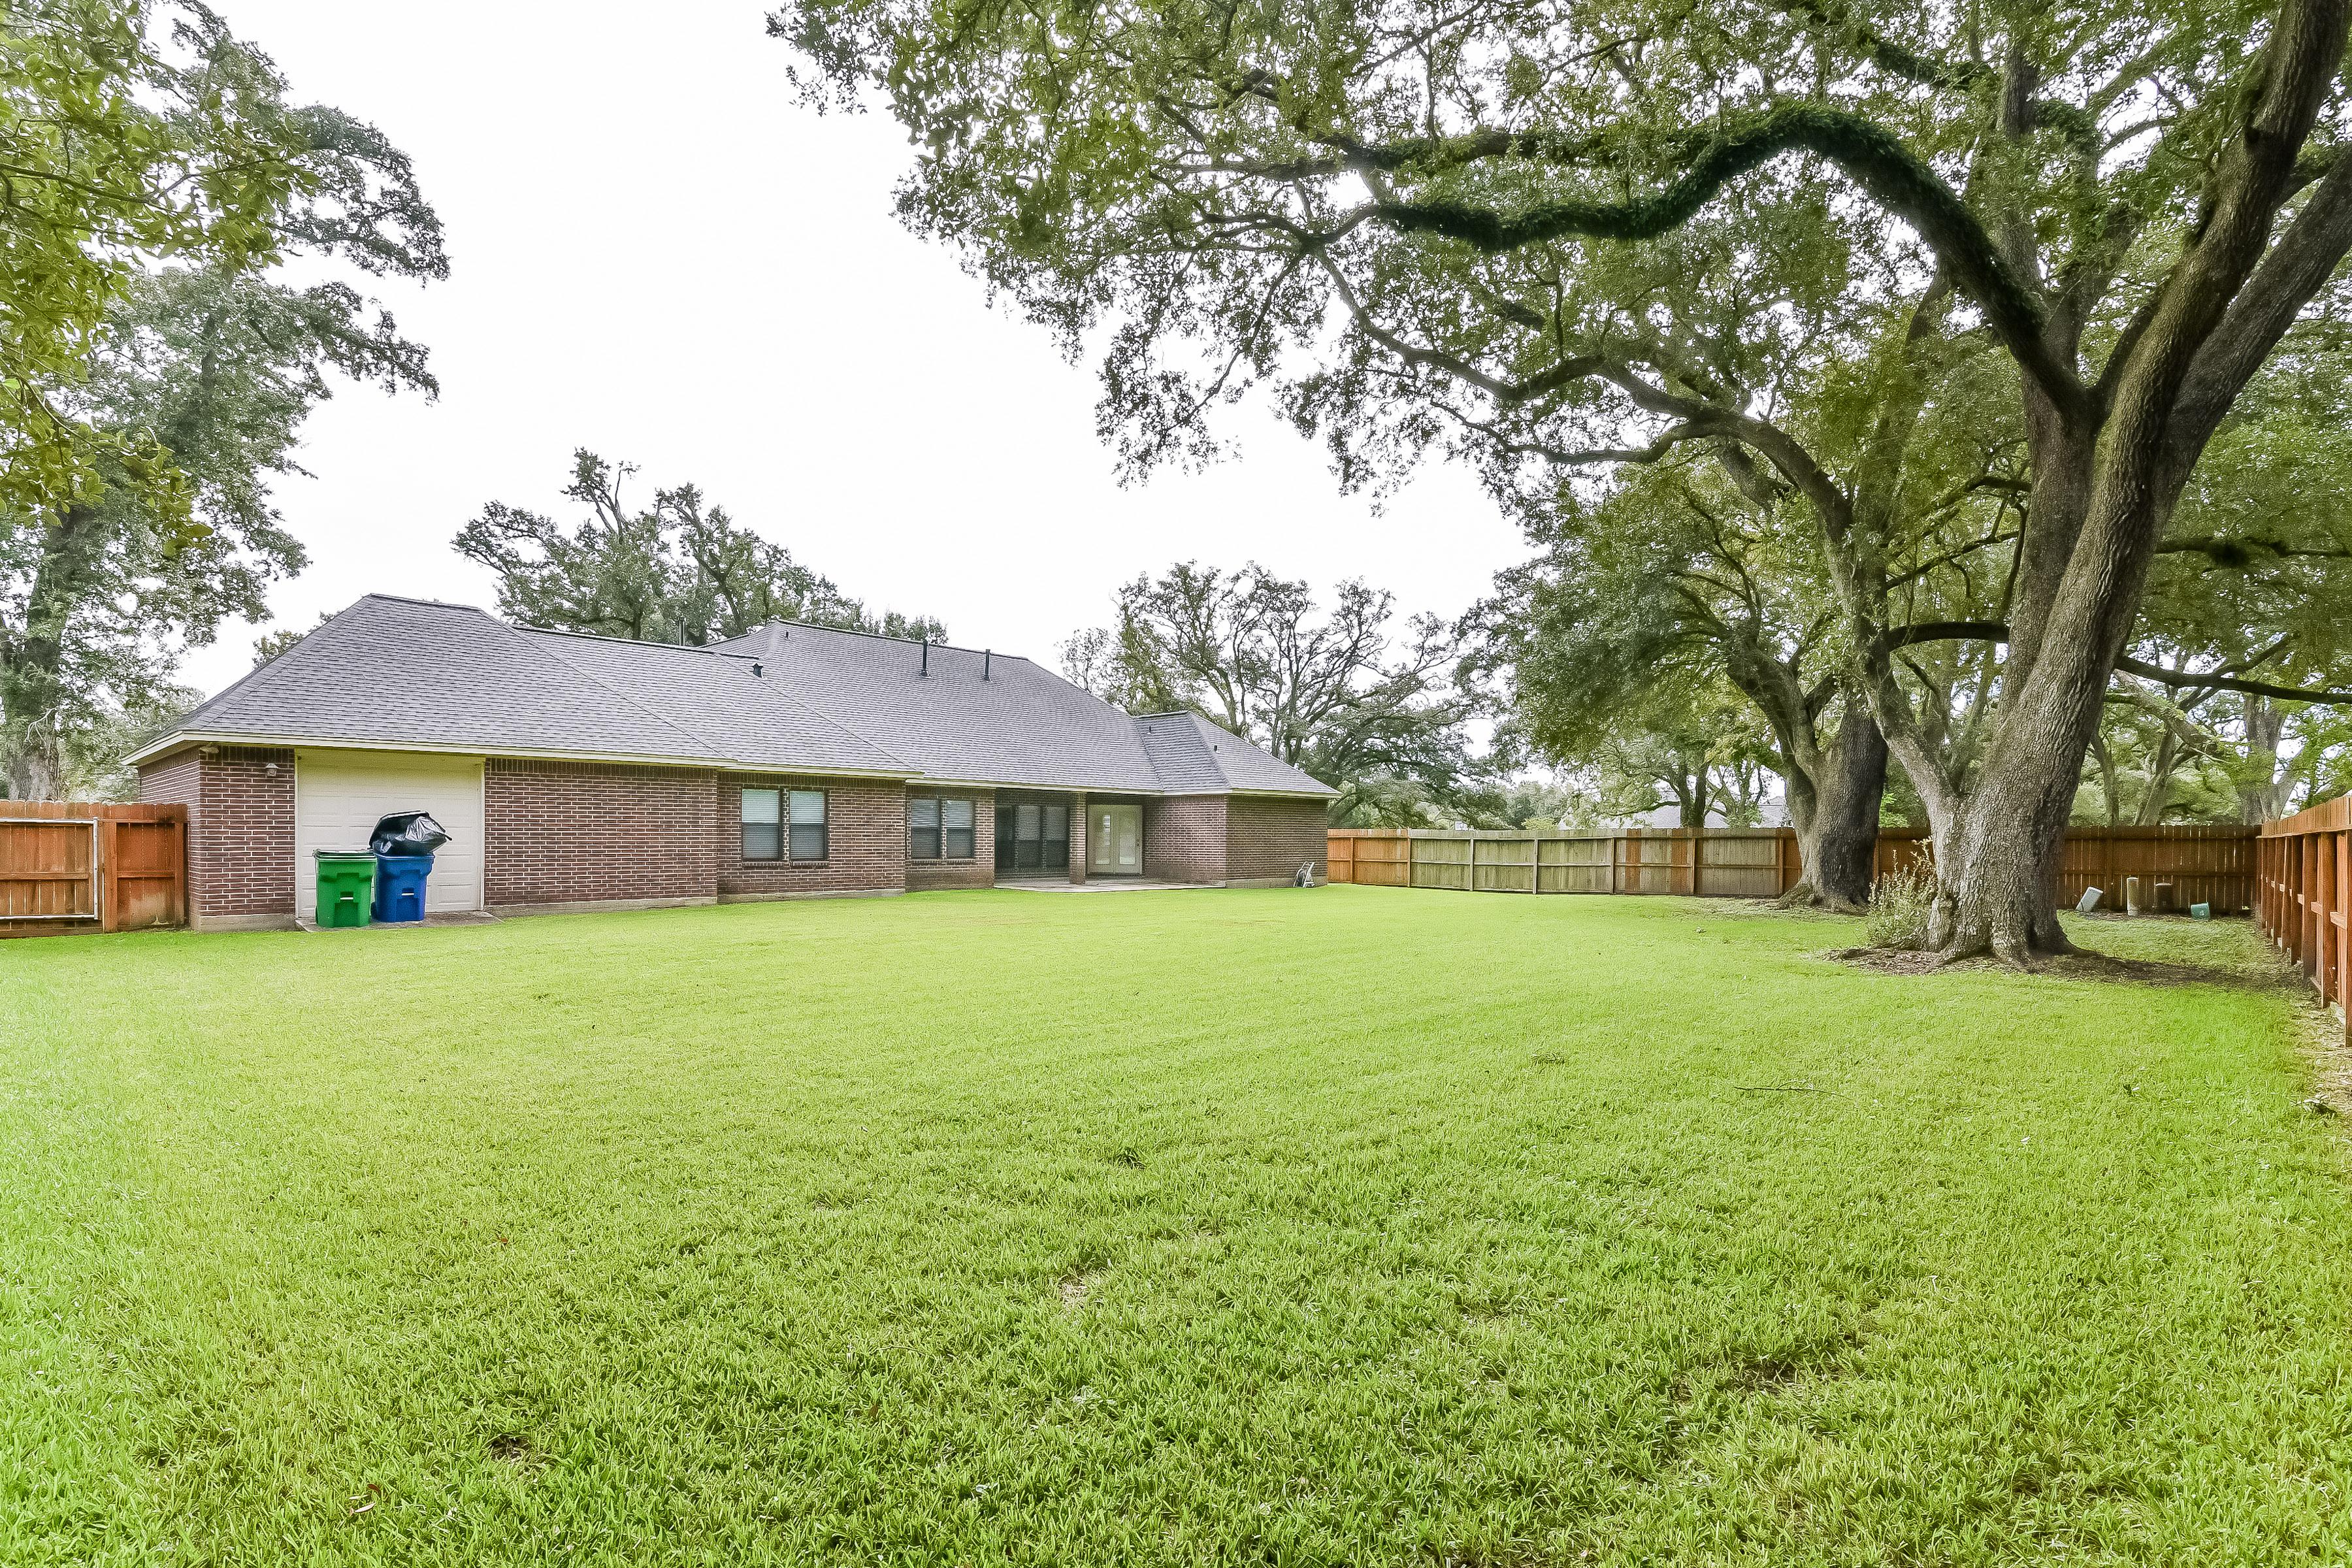 Photo of 805 Heritage Oaks Dr, Angleton, TX, 77515